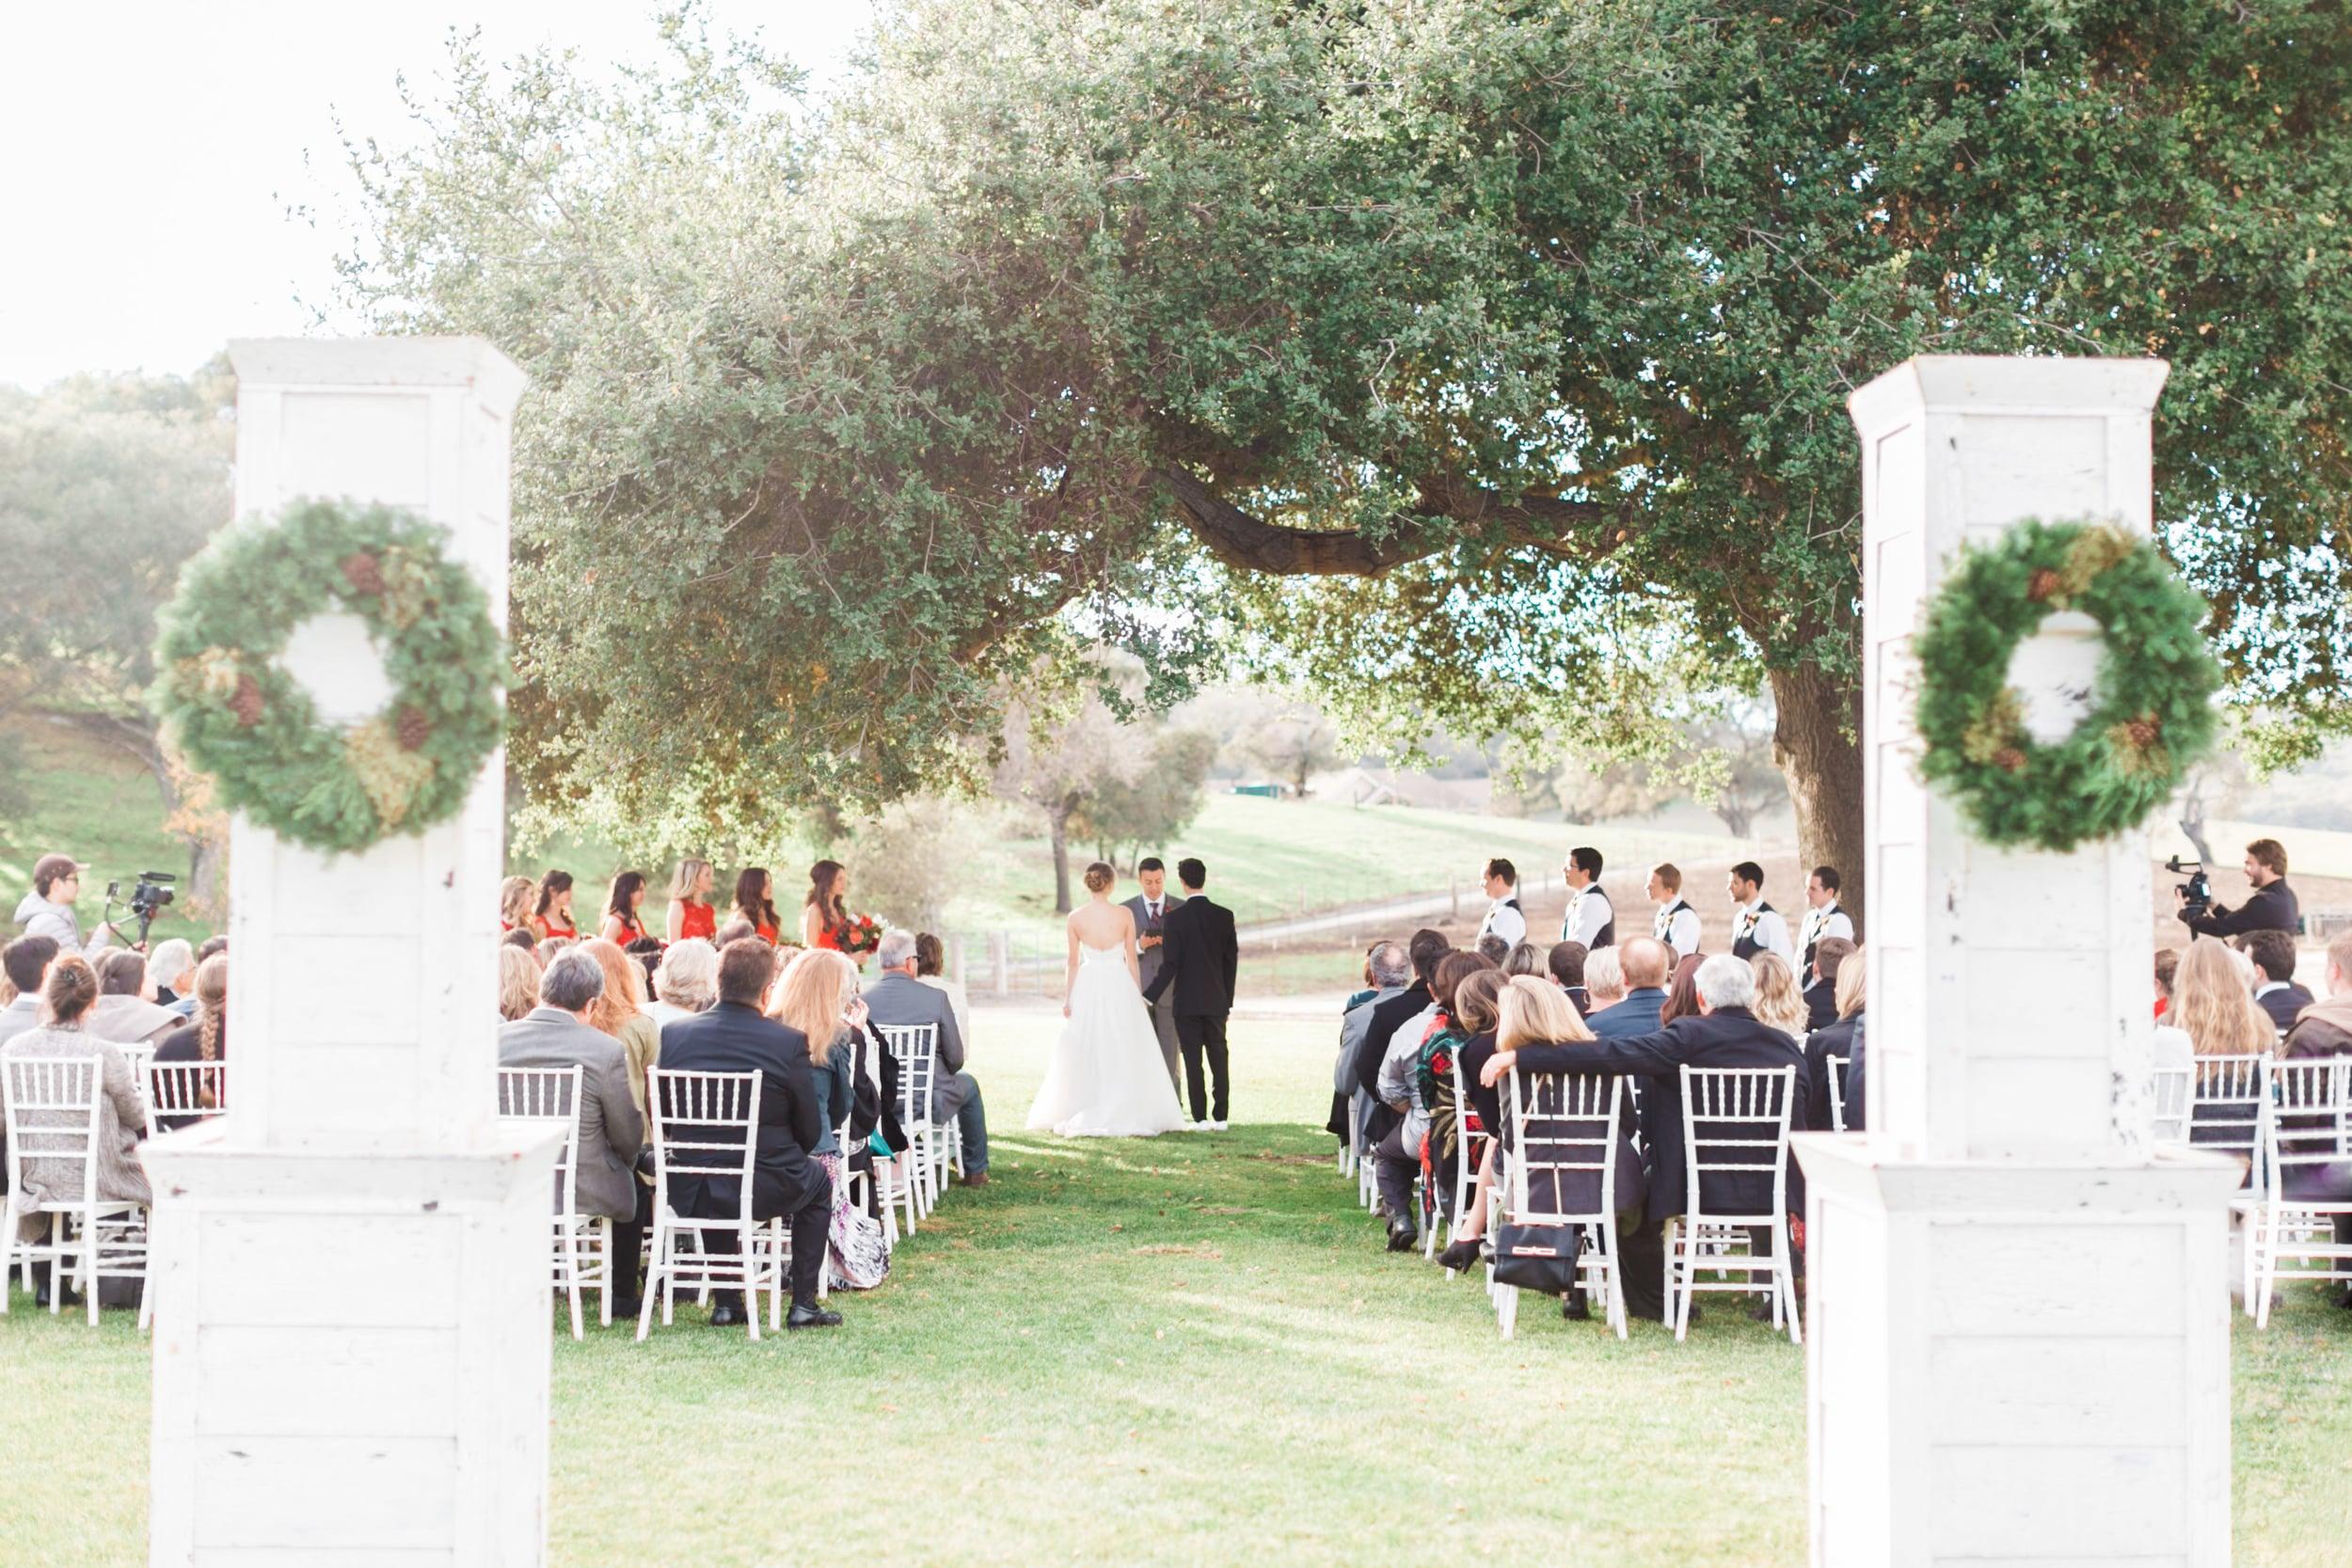 Natalie_Schutt_Photography_Winter_Wedding_San_Luis_Obispo-115.jpg